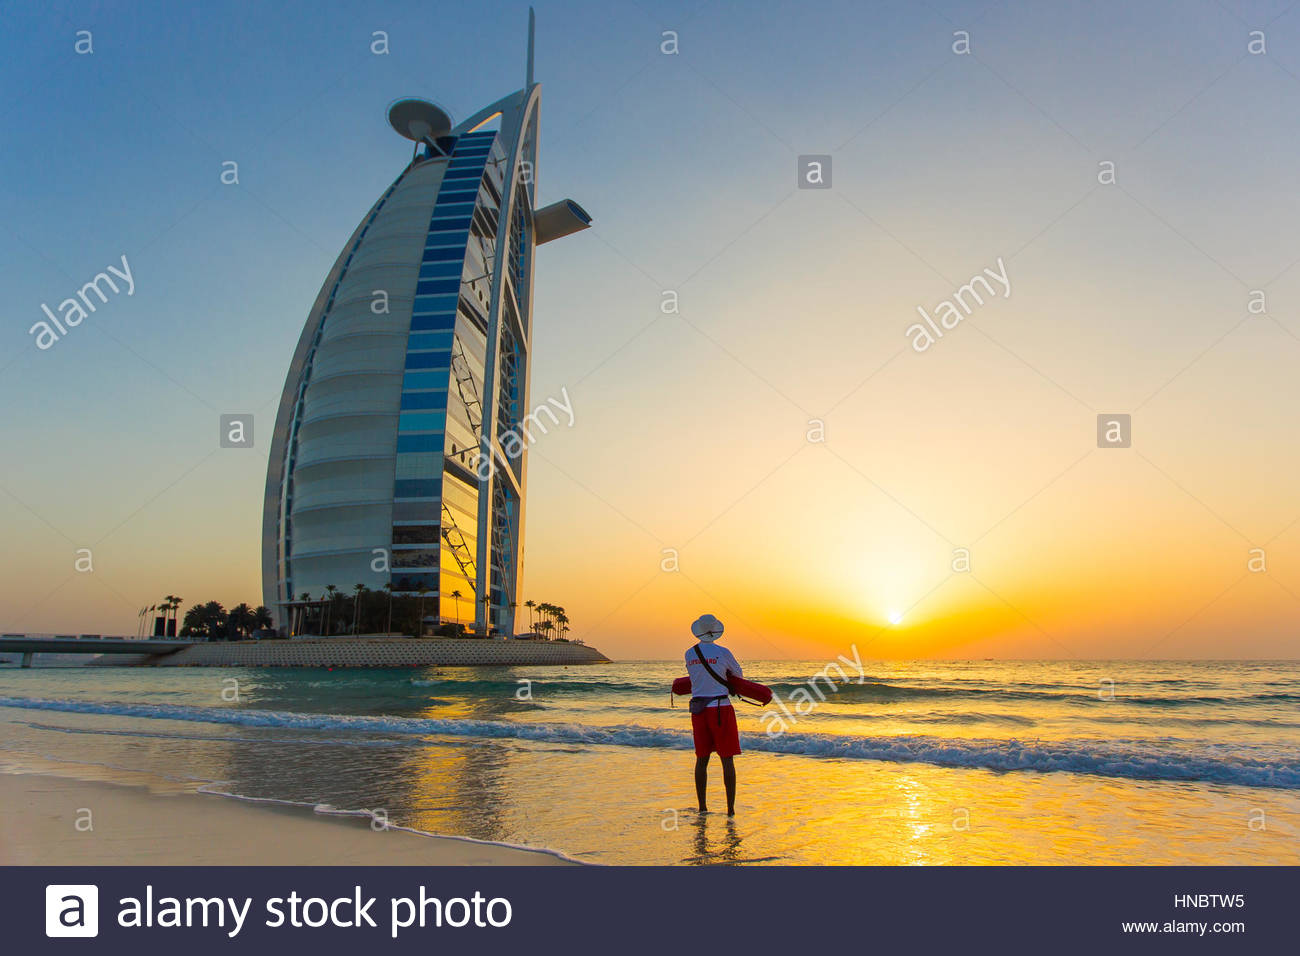 A lifeguard watching the sunset near the Burj Al Arab hotel, on the Persian Gulf. - Stock Image